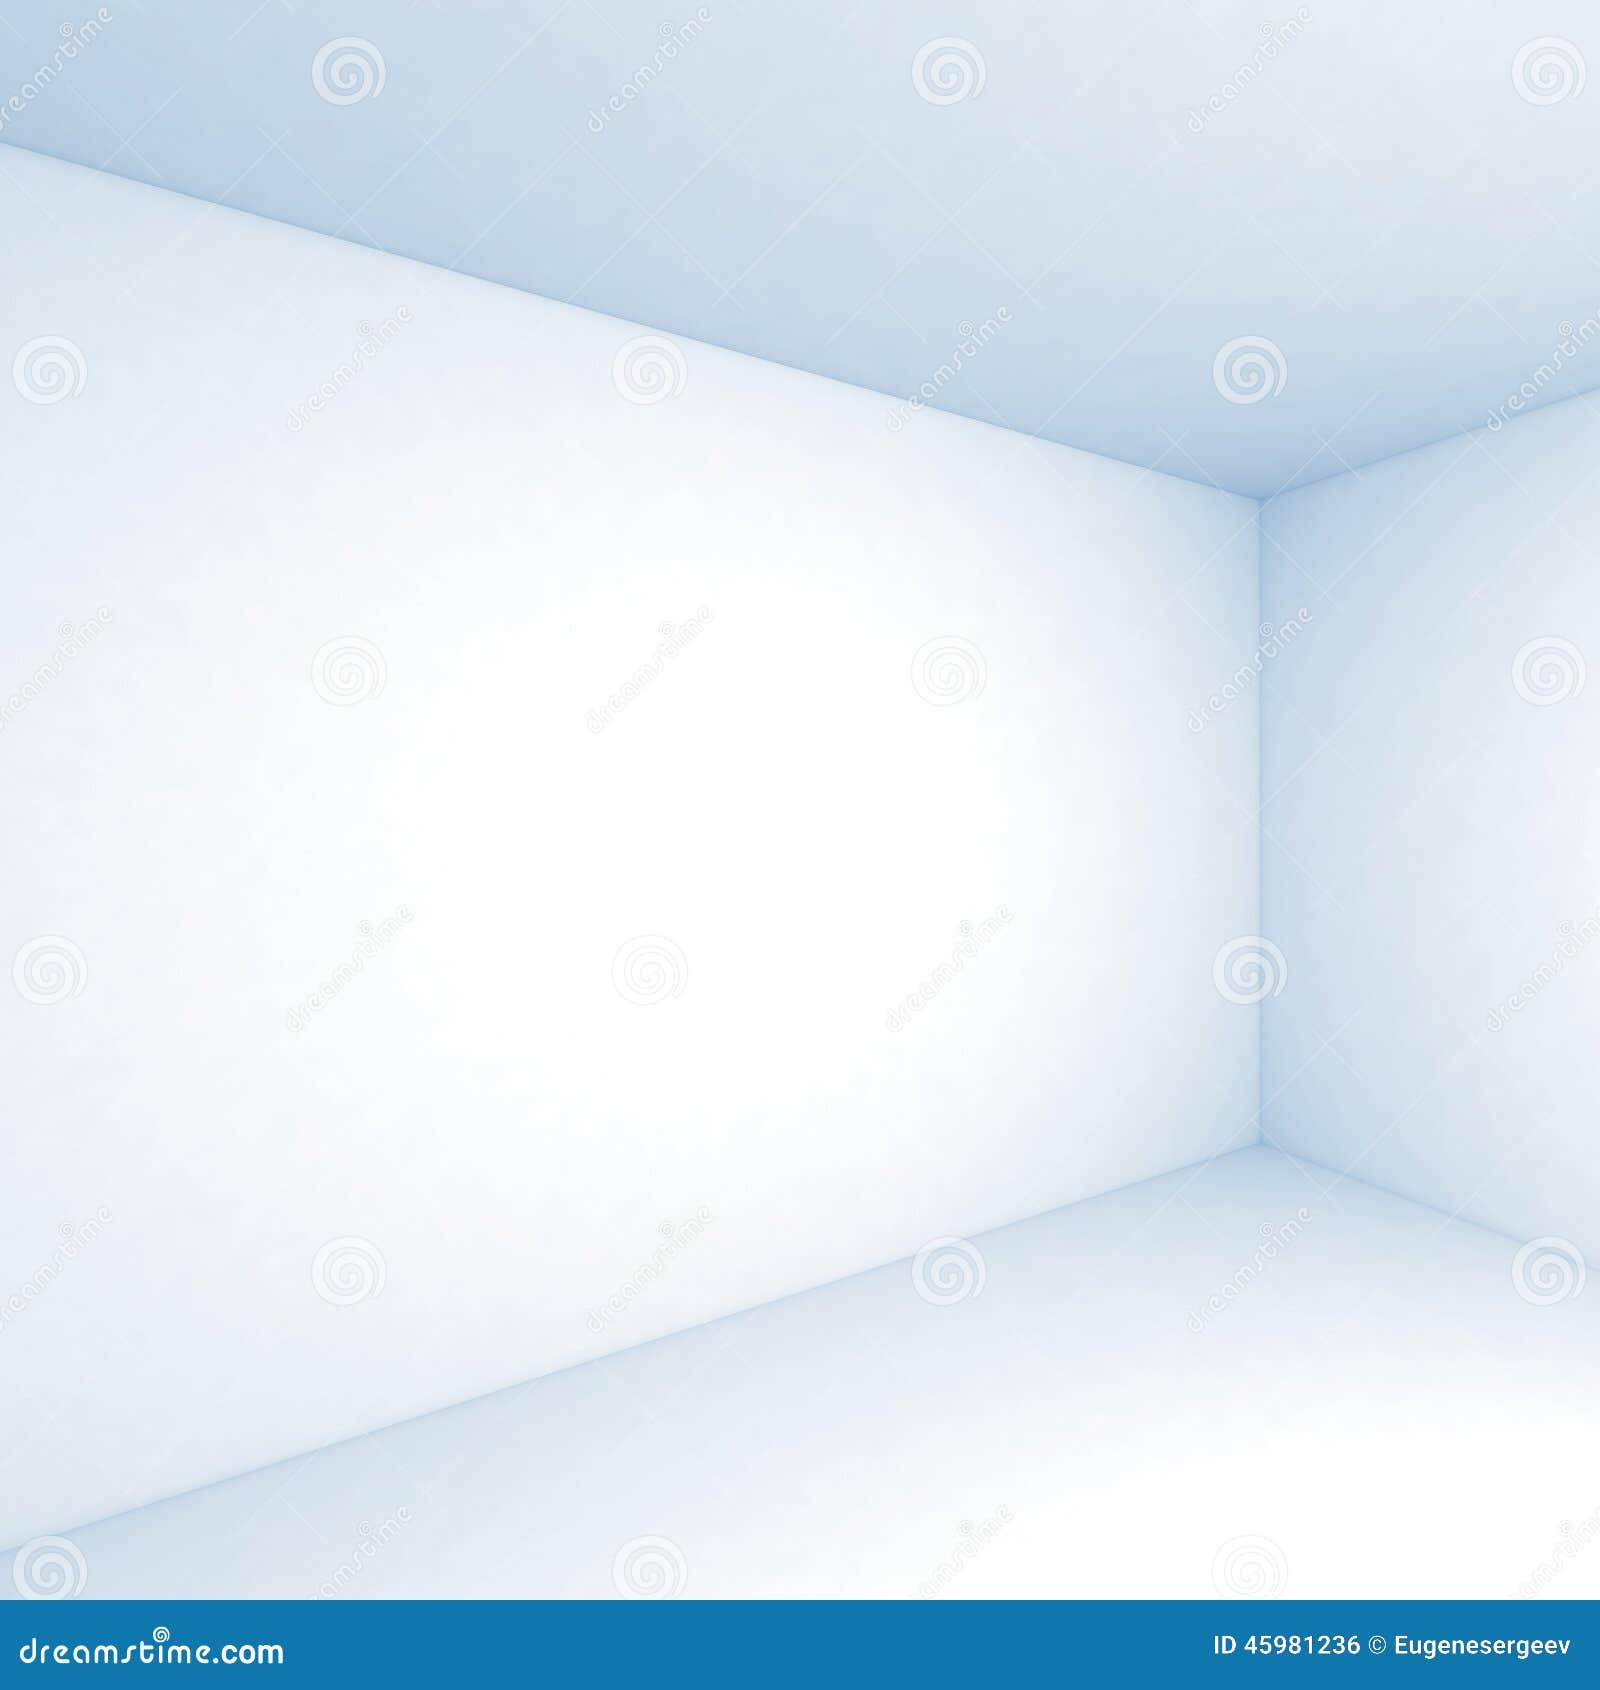 Empty White 3d Room Interior Square Background Stock